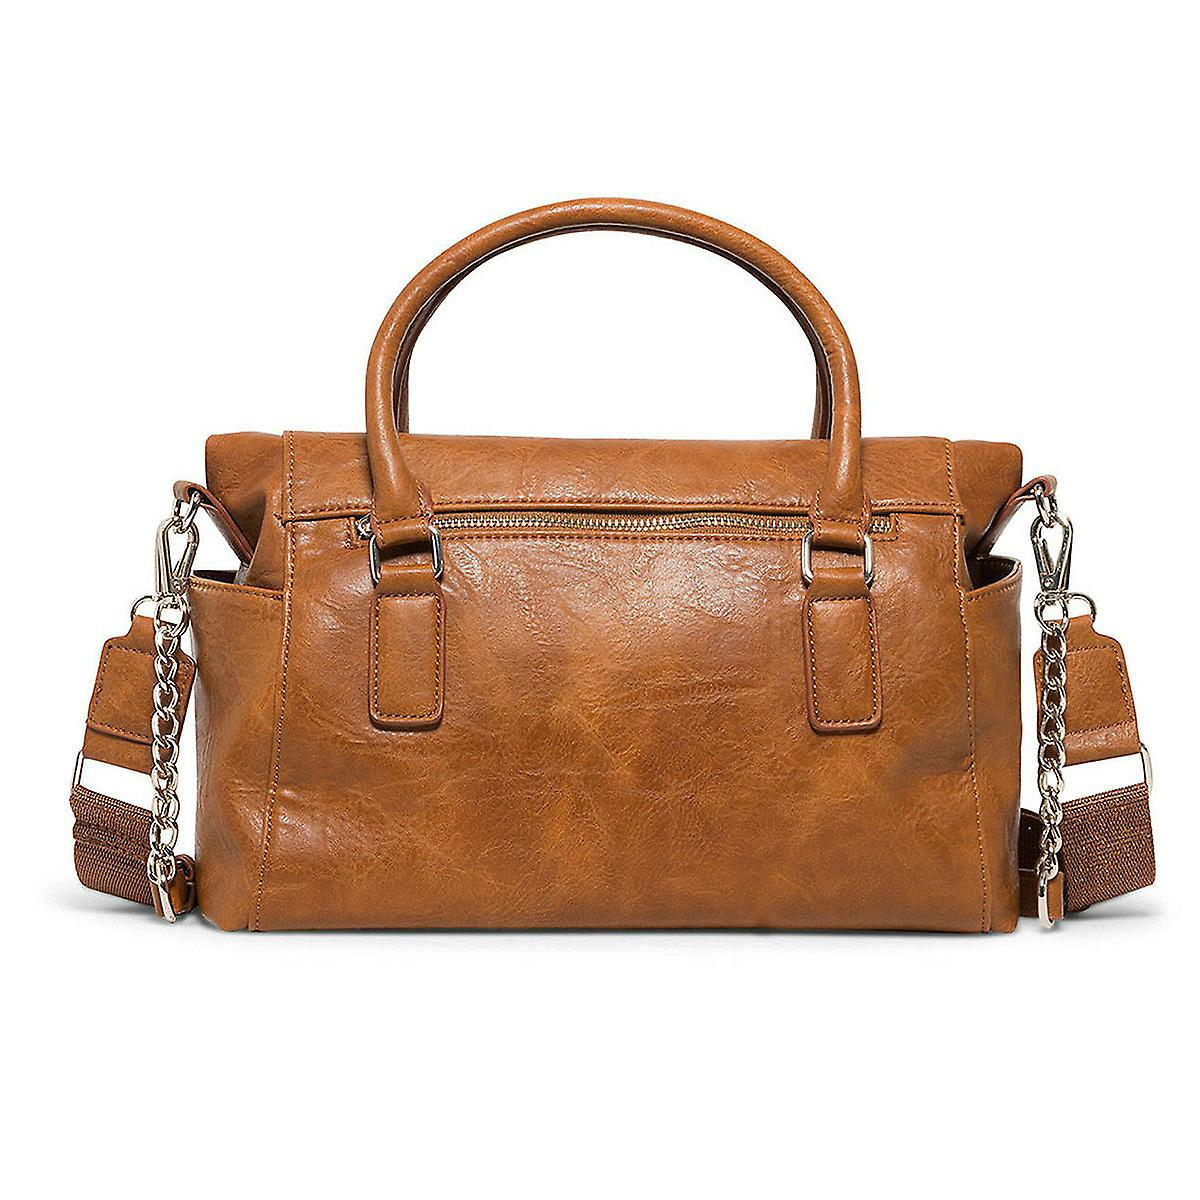 186d2f82cd9 18WAXPAB bag BOLs of Loverty Fruugo dark amber bag Desigual shoulder fwOvvS